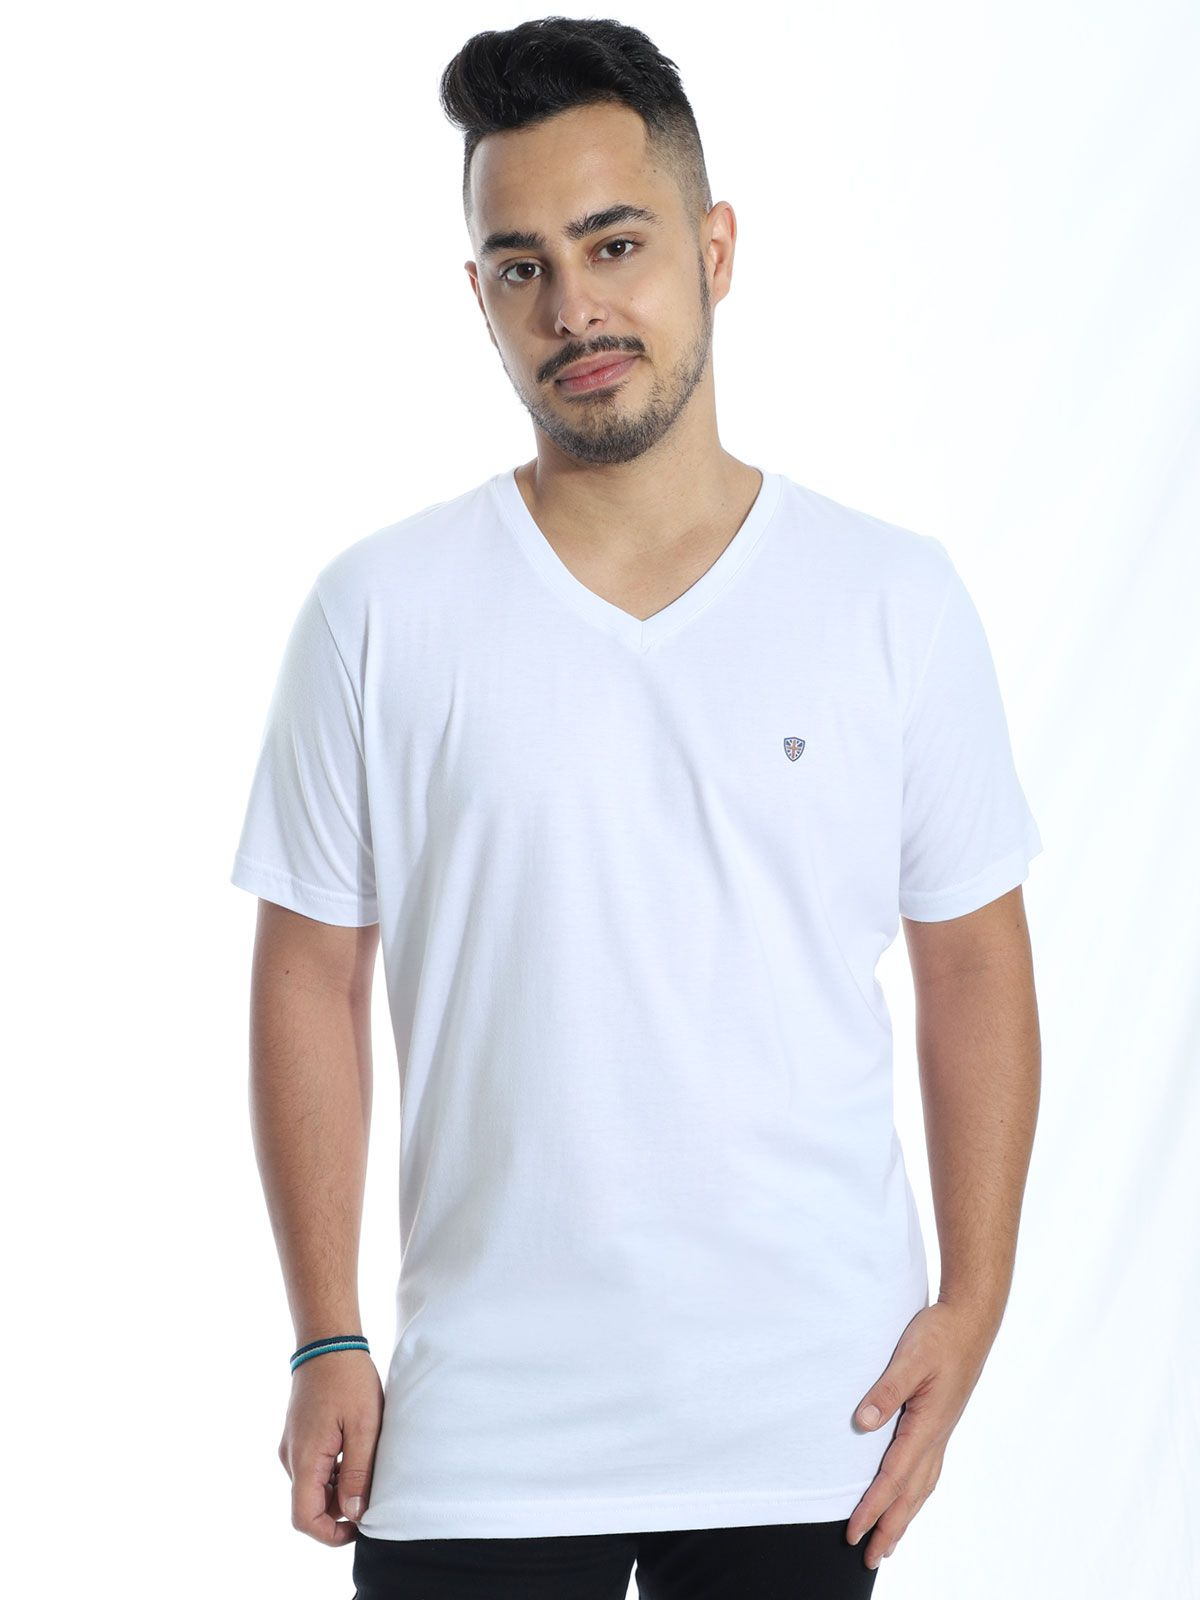 Camiseta Masculina Básica Decote V. Estampada Kingdom Branco